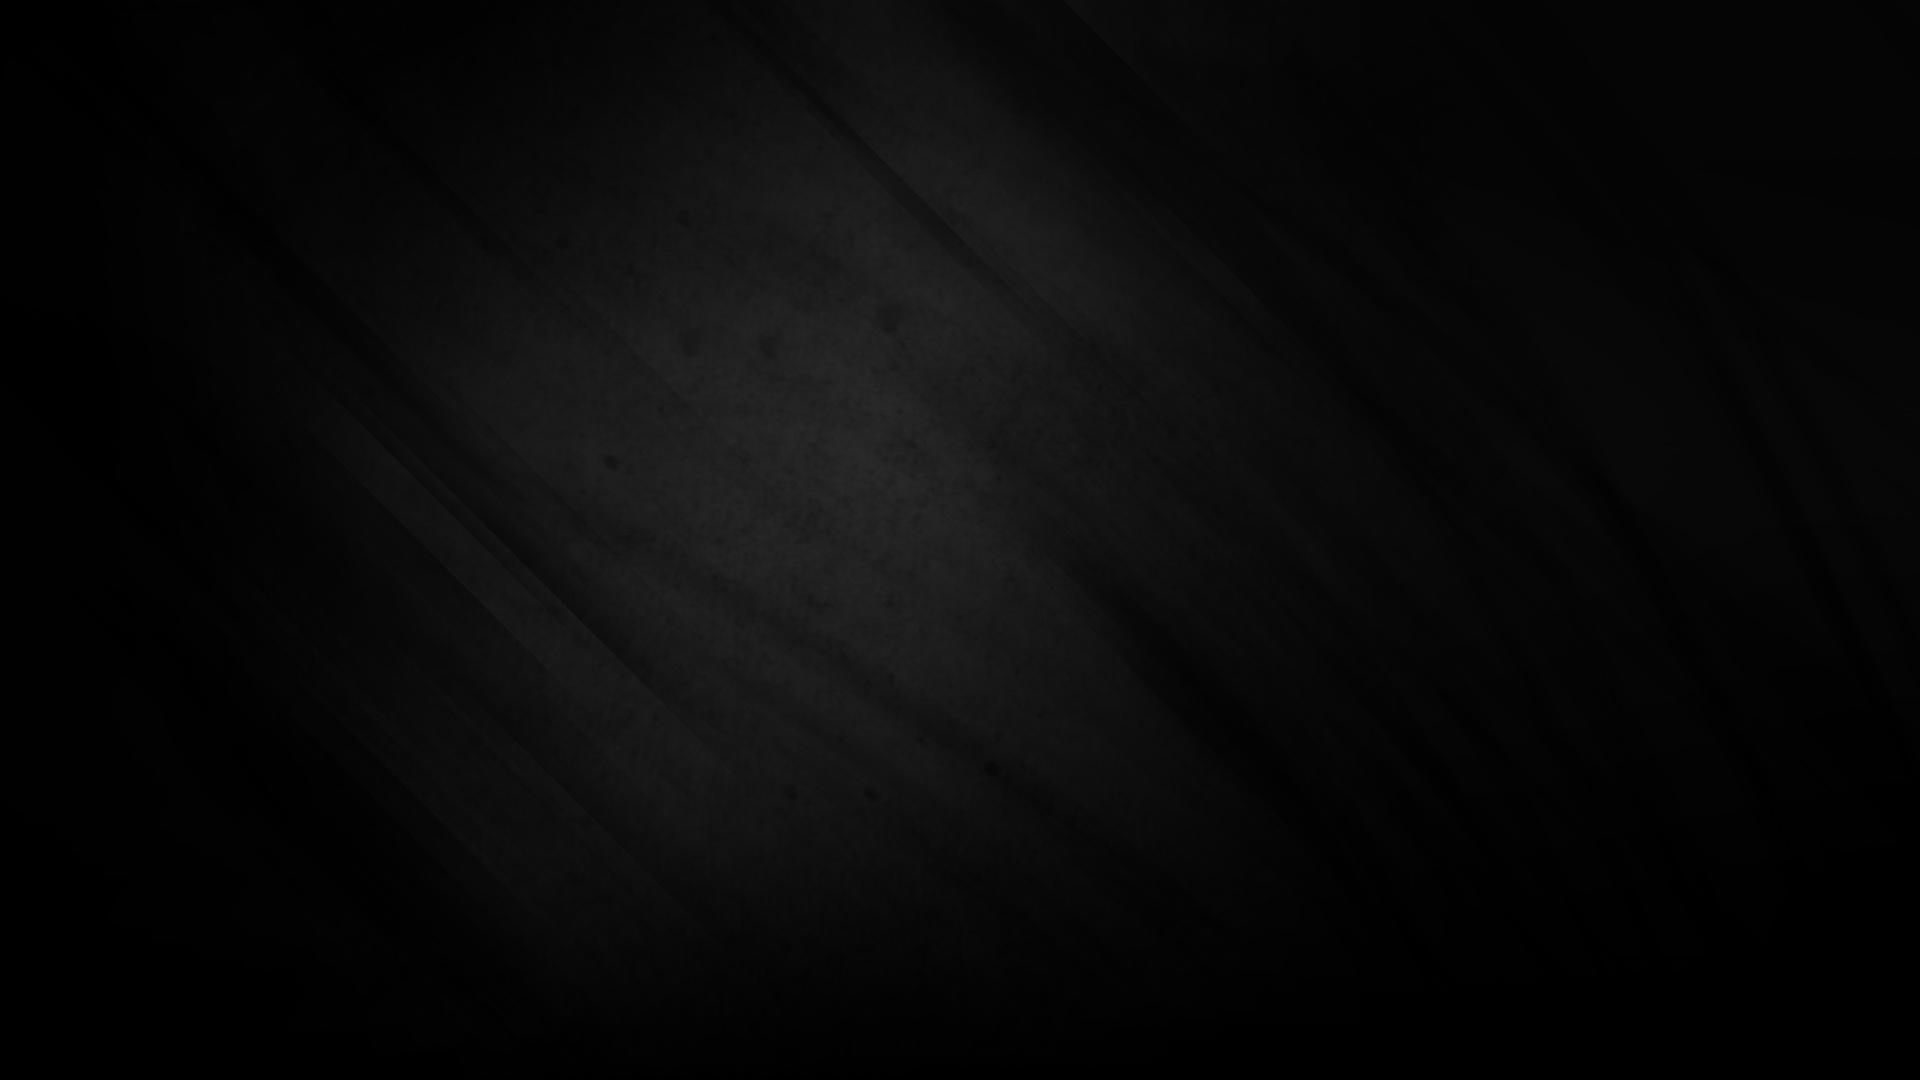 Blank Wallpaper 1920x1080